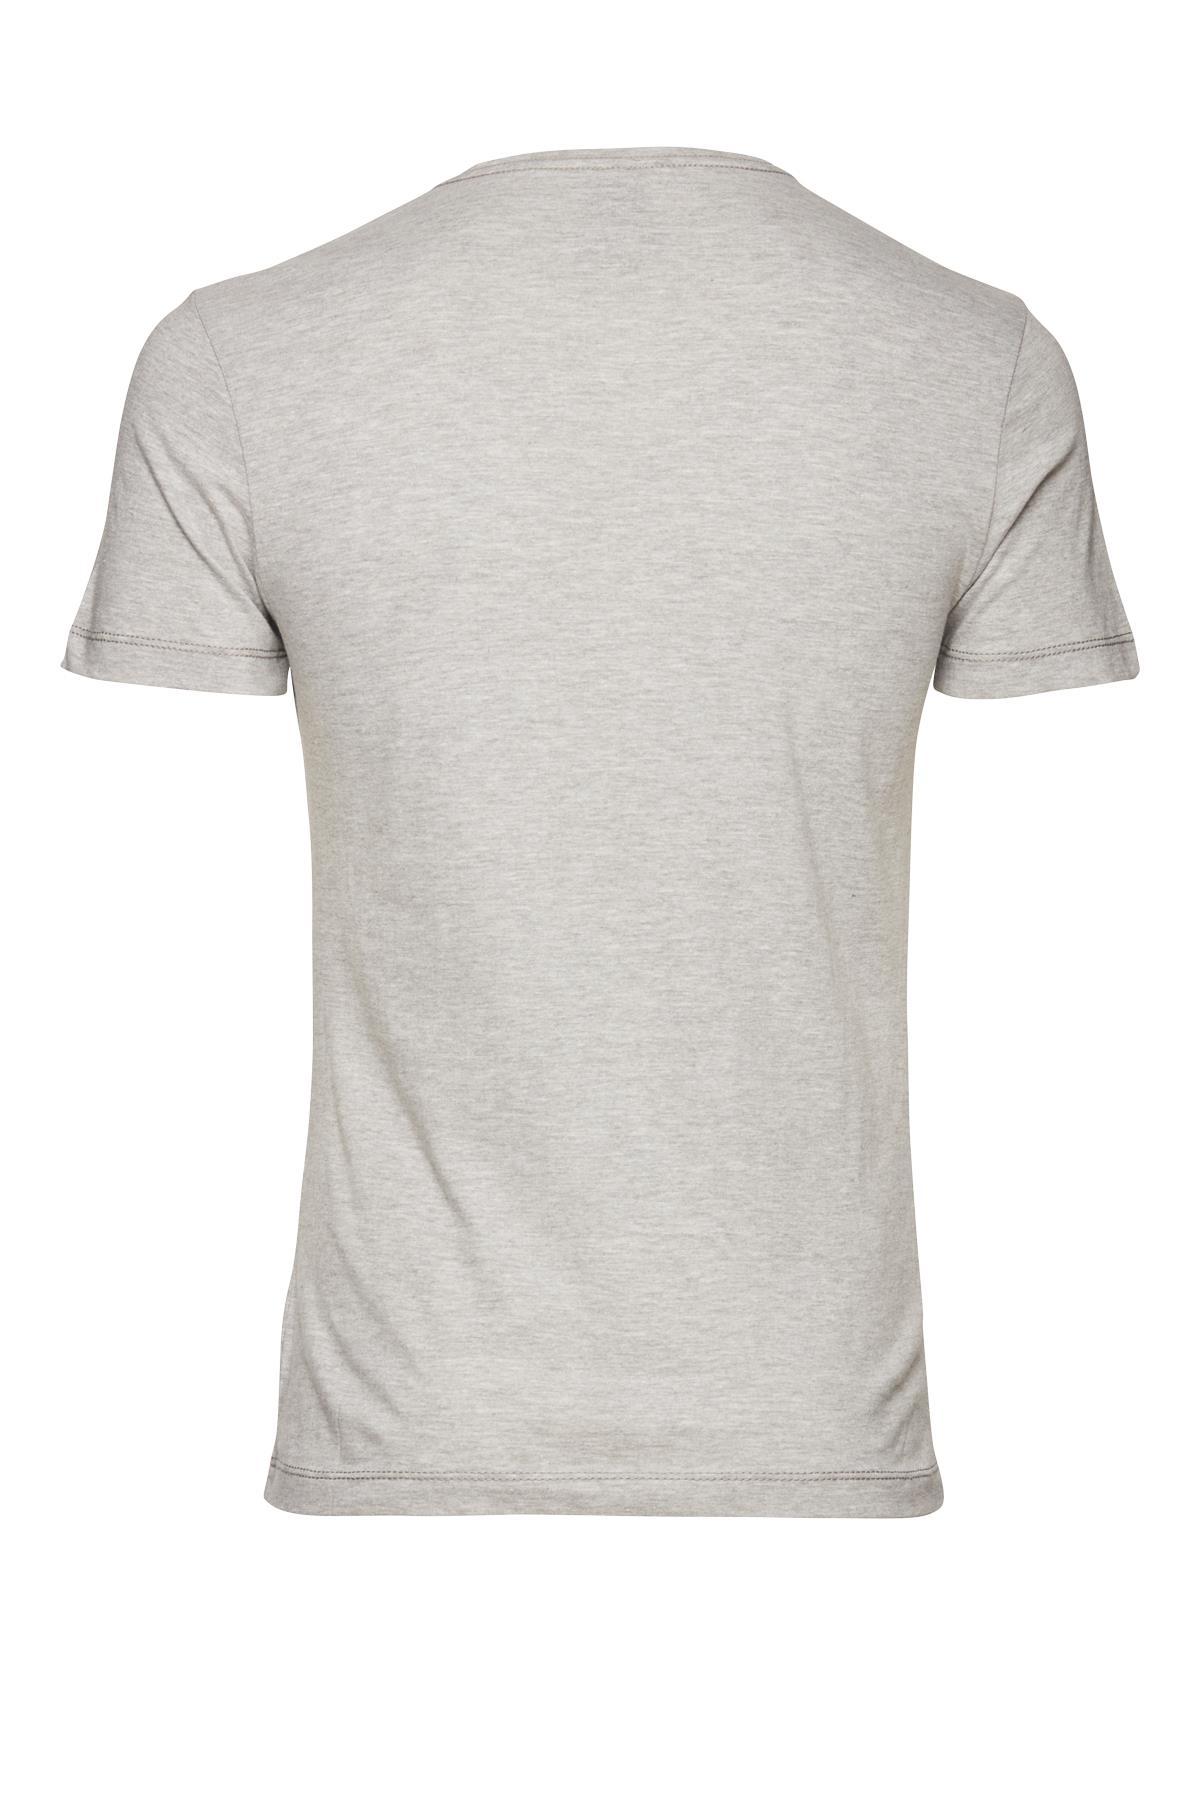 Stone mix T-shirt – Køb Stone mix T-shirt fra str. M-XXL her